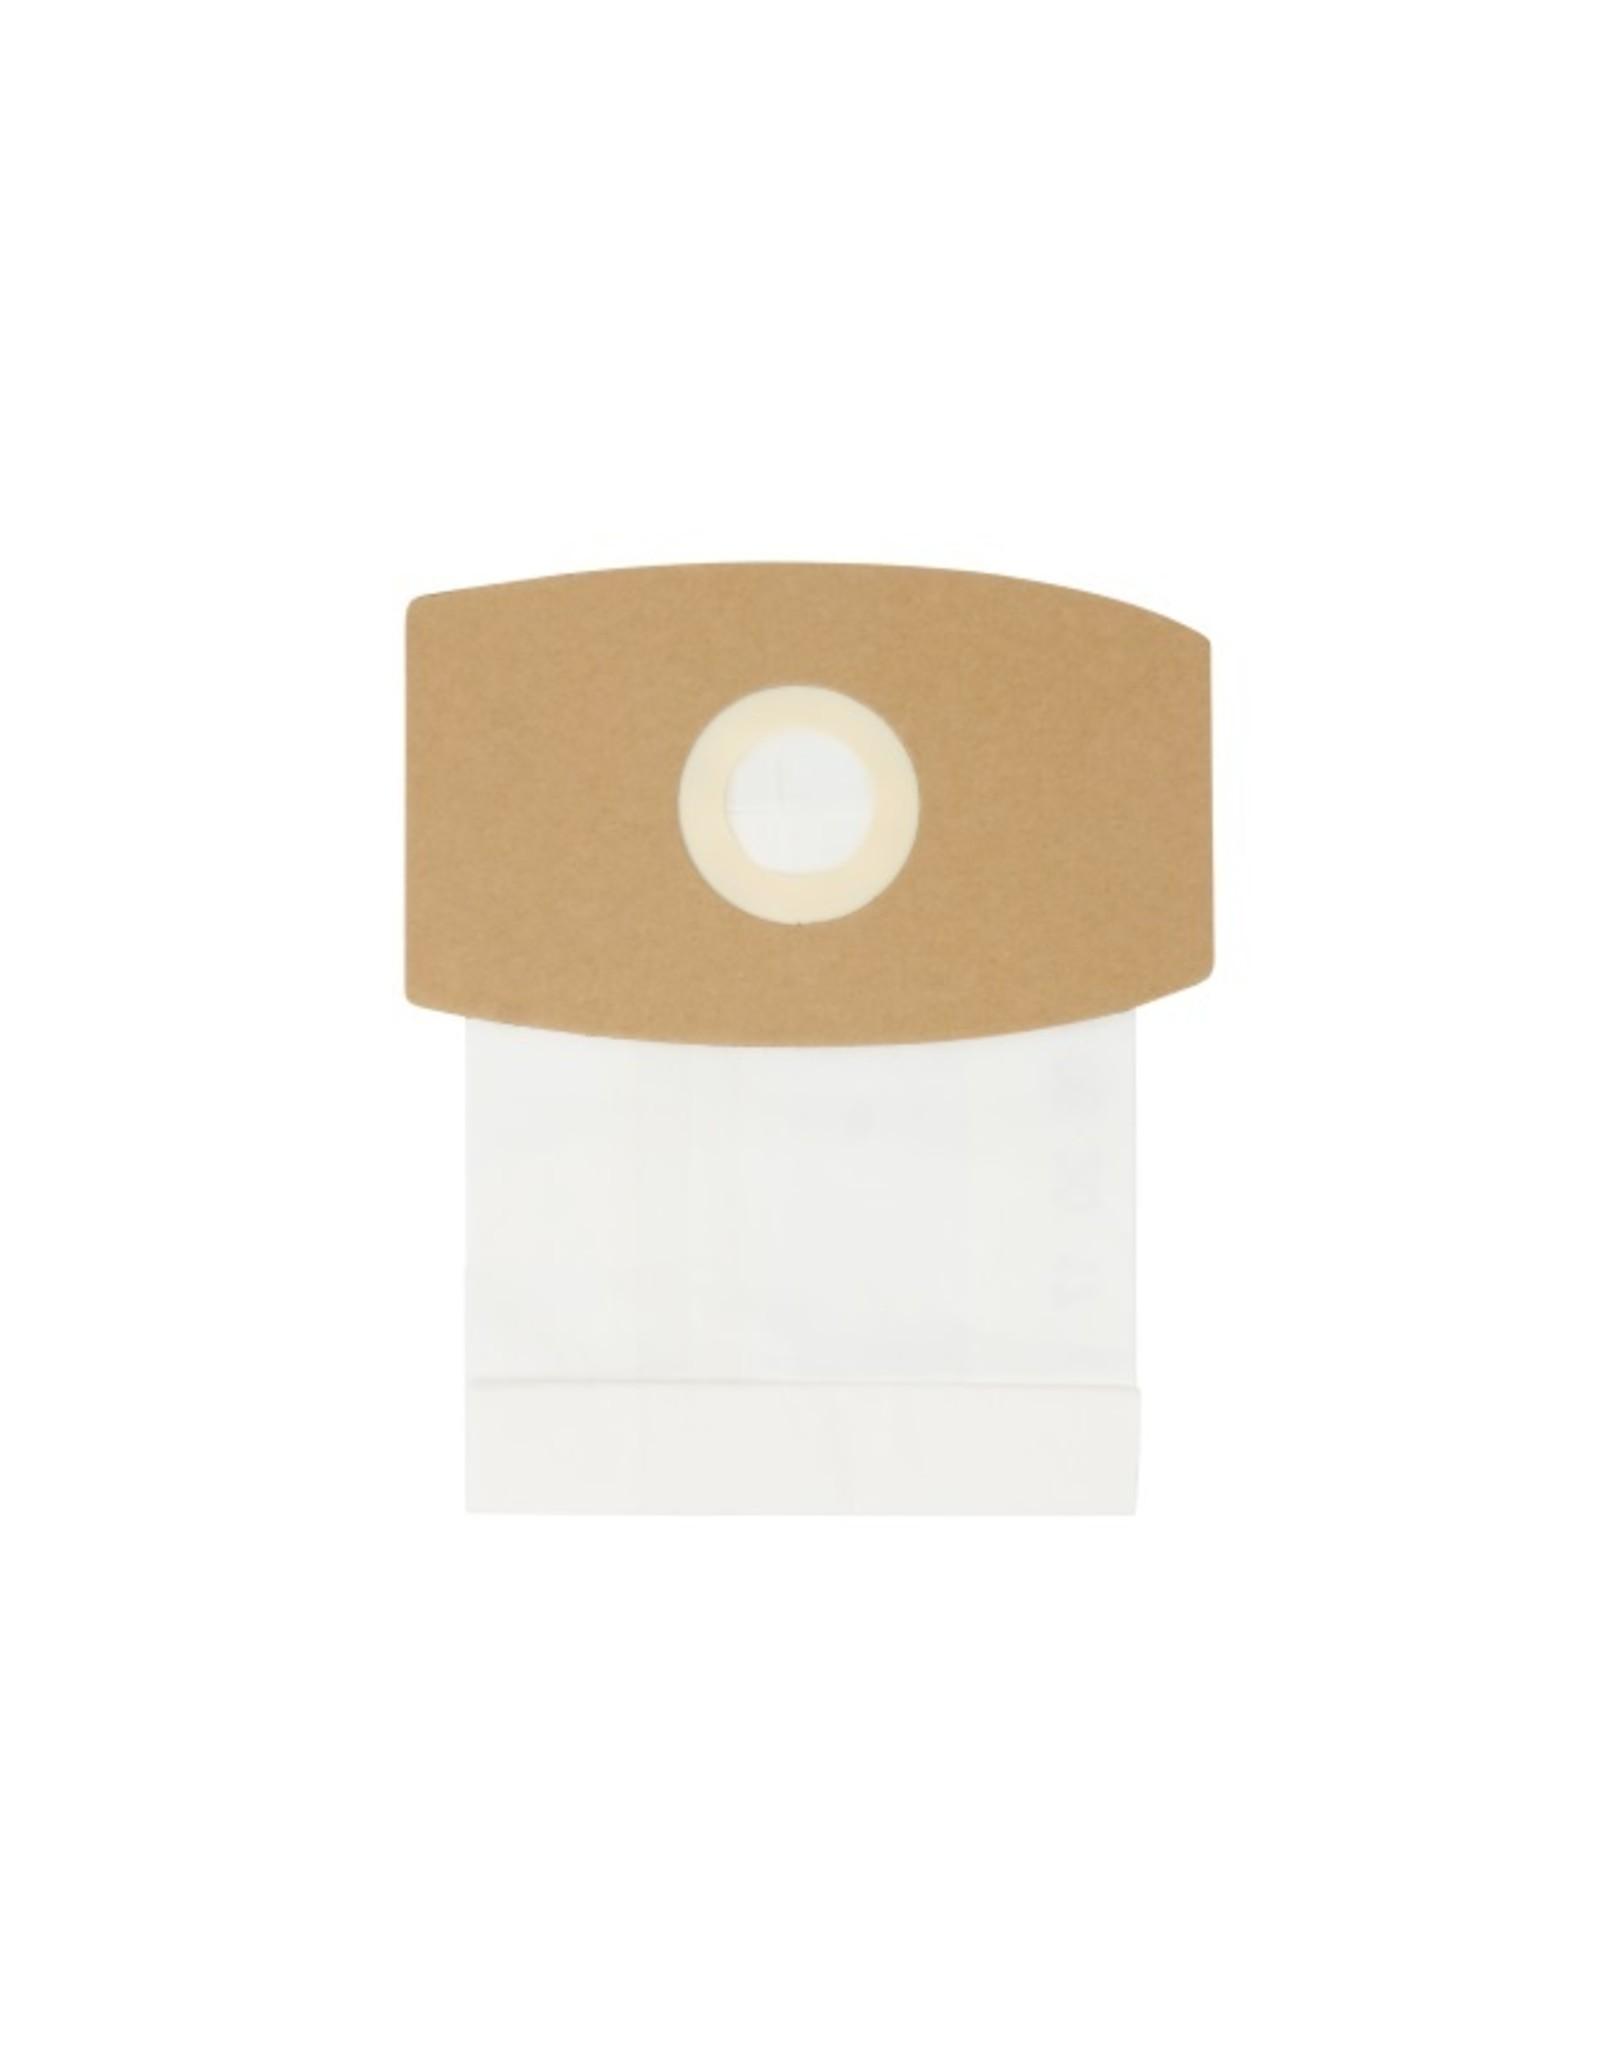 Riccar Riccar SupraQuick S Bags (6 Pack)